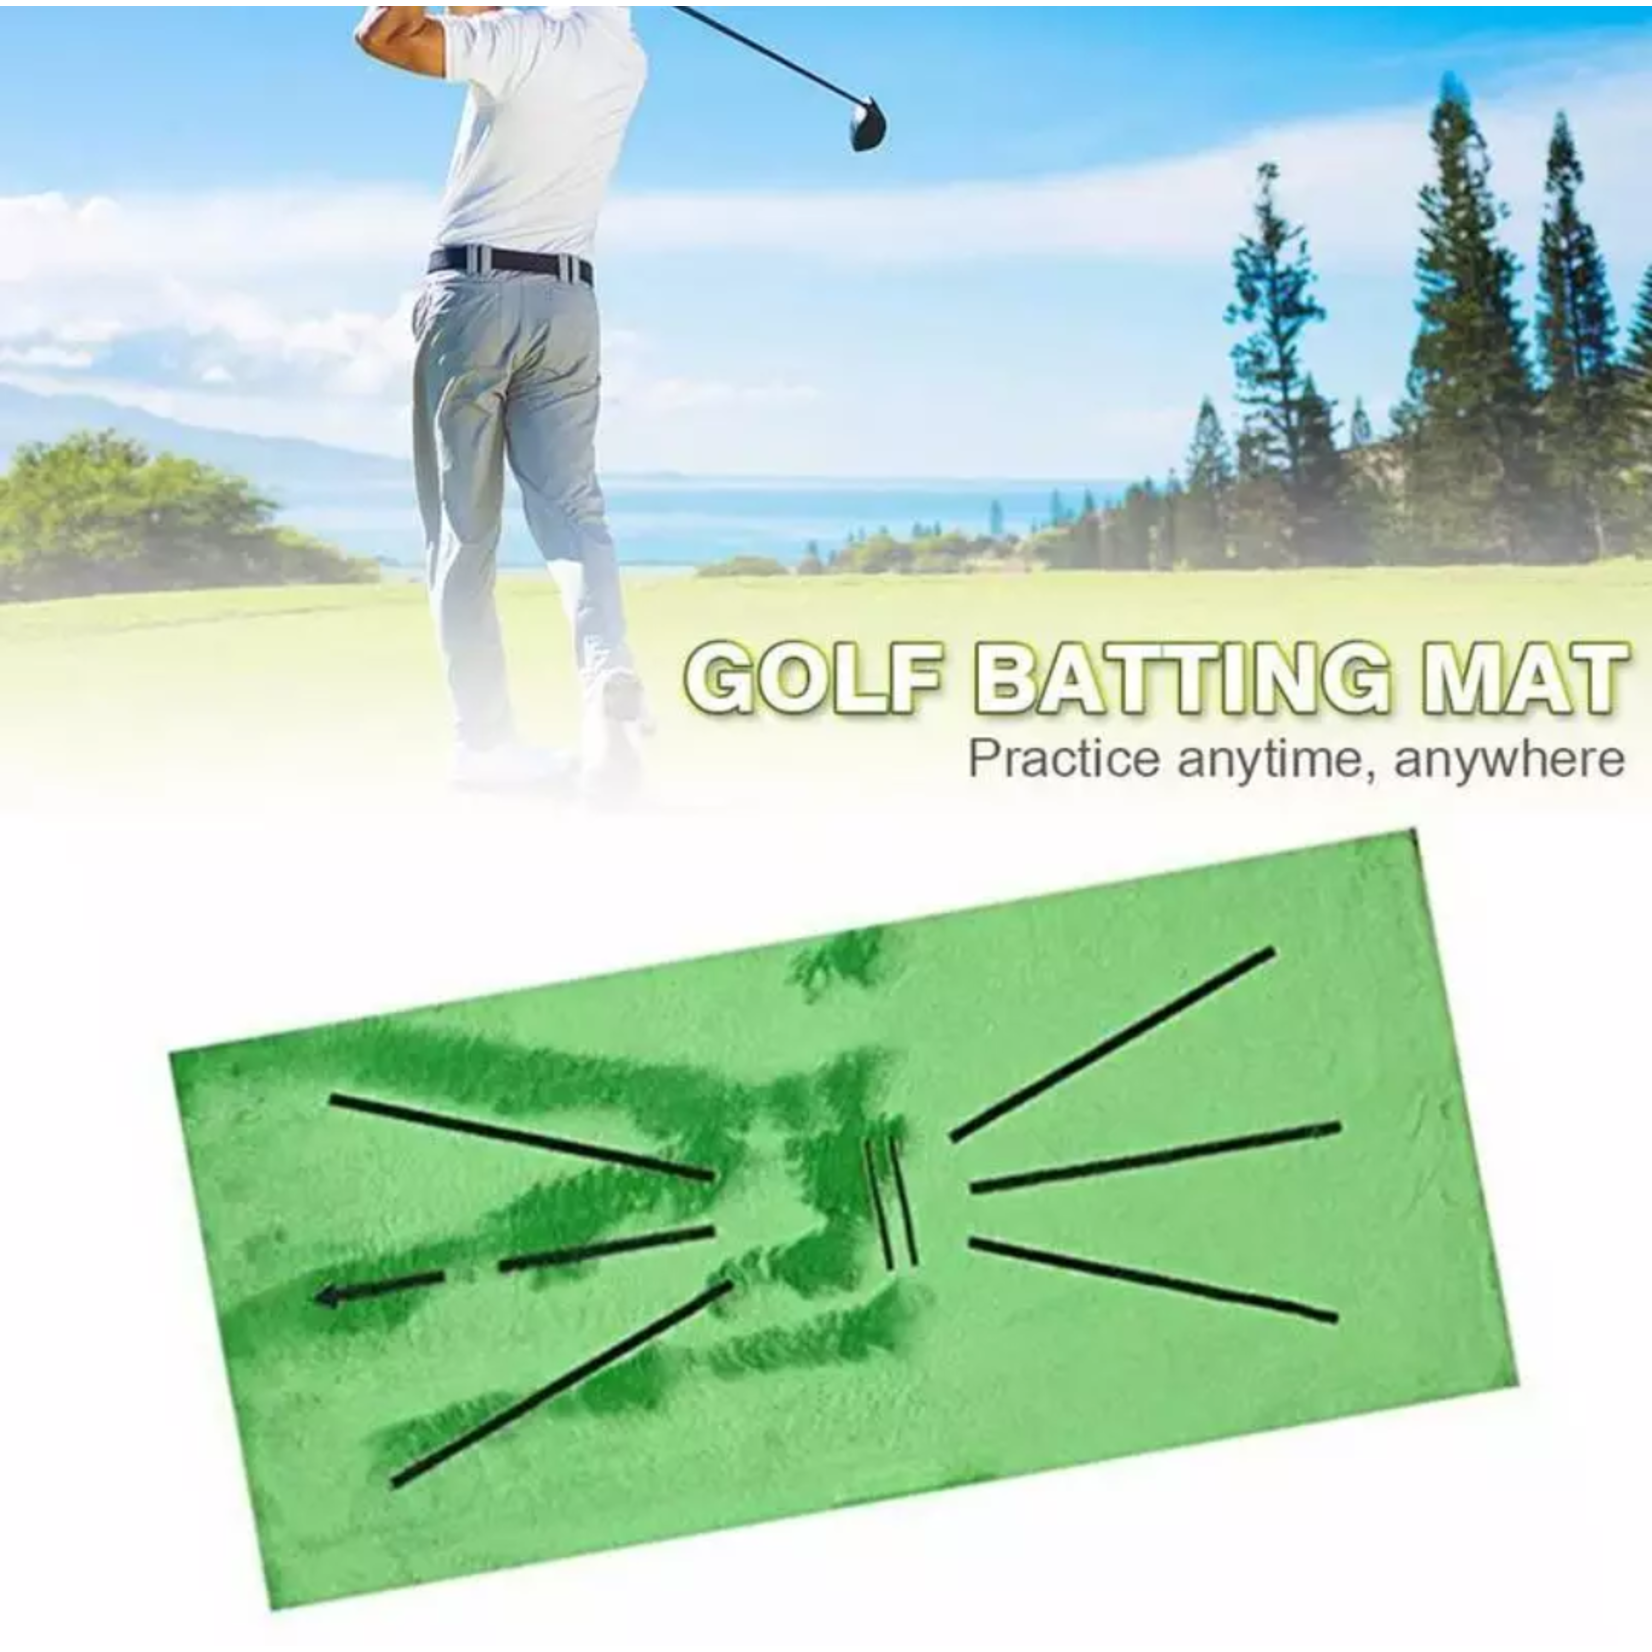 Jobber Golf Jobber Golf – Golf oefenmat / afslagmat